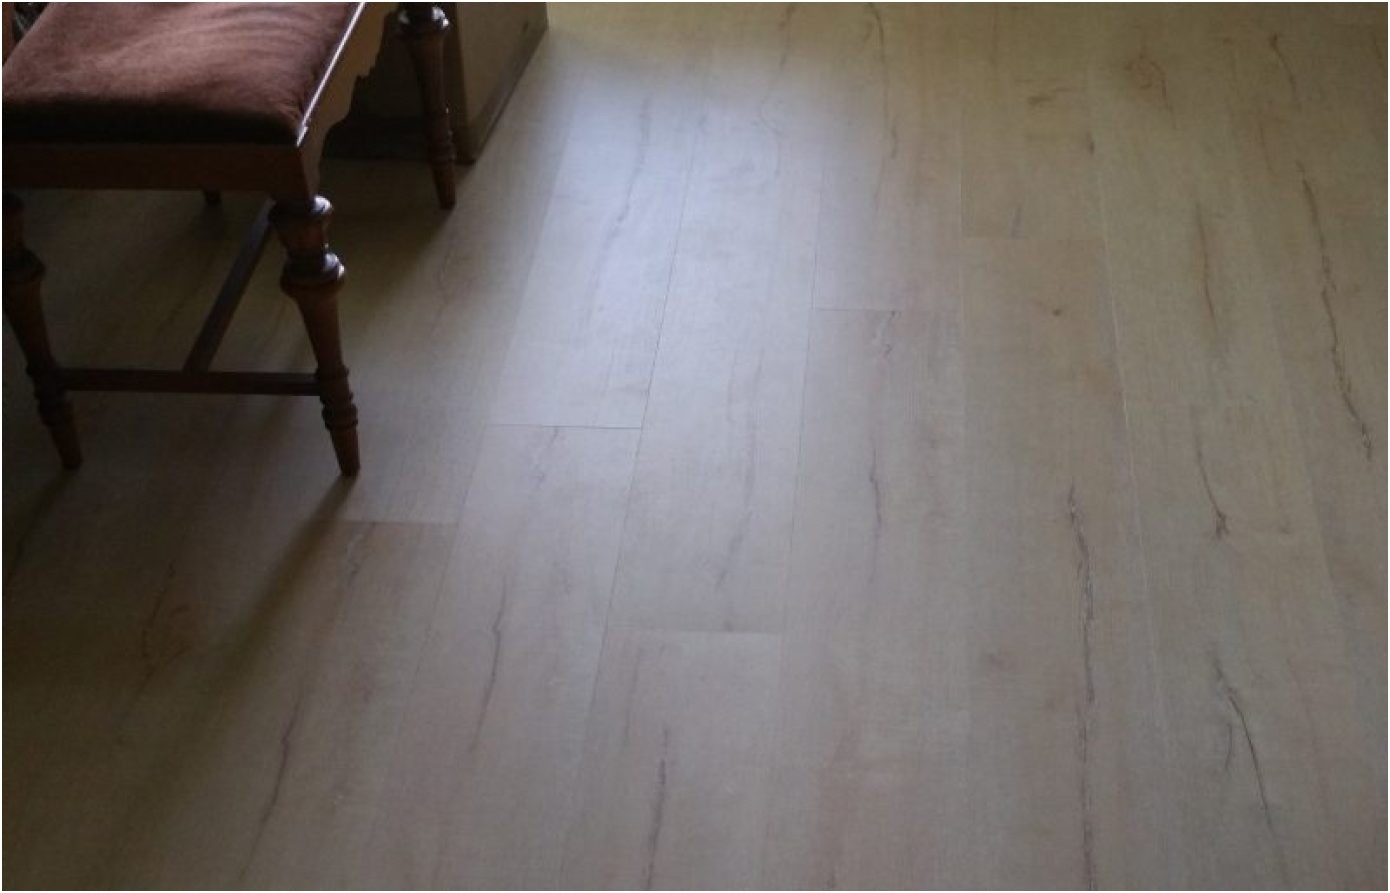 8 plank hardwood flooring of high end vinyl wood flooring collection 8 7 in x 47 6 in golden oak intended for high end vinyl wood flooring images best way to clean vinyl plank floors luxury floor a